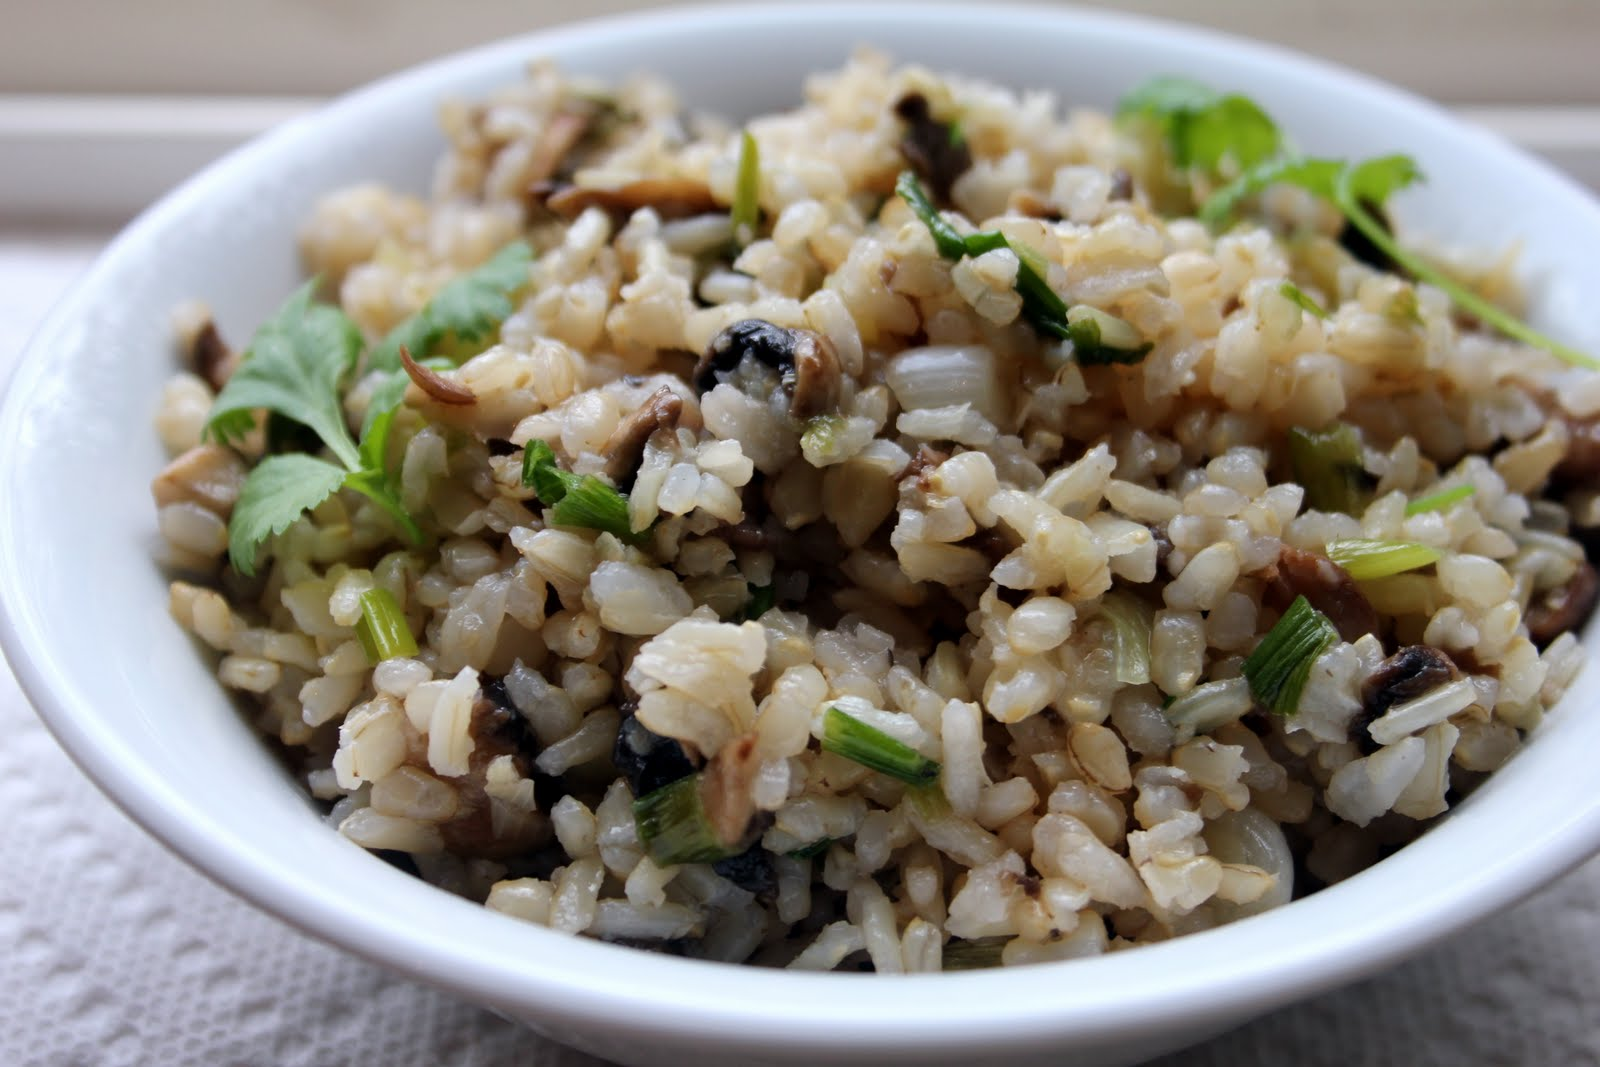 mushroom rice pilaf_C.F.-05.29.13.jpg